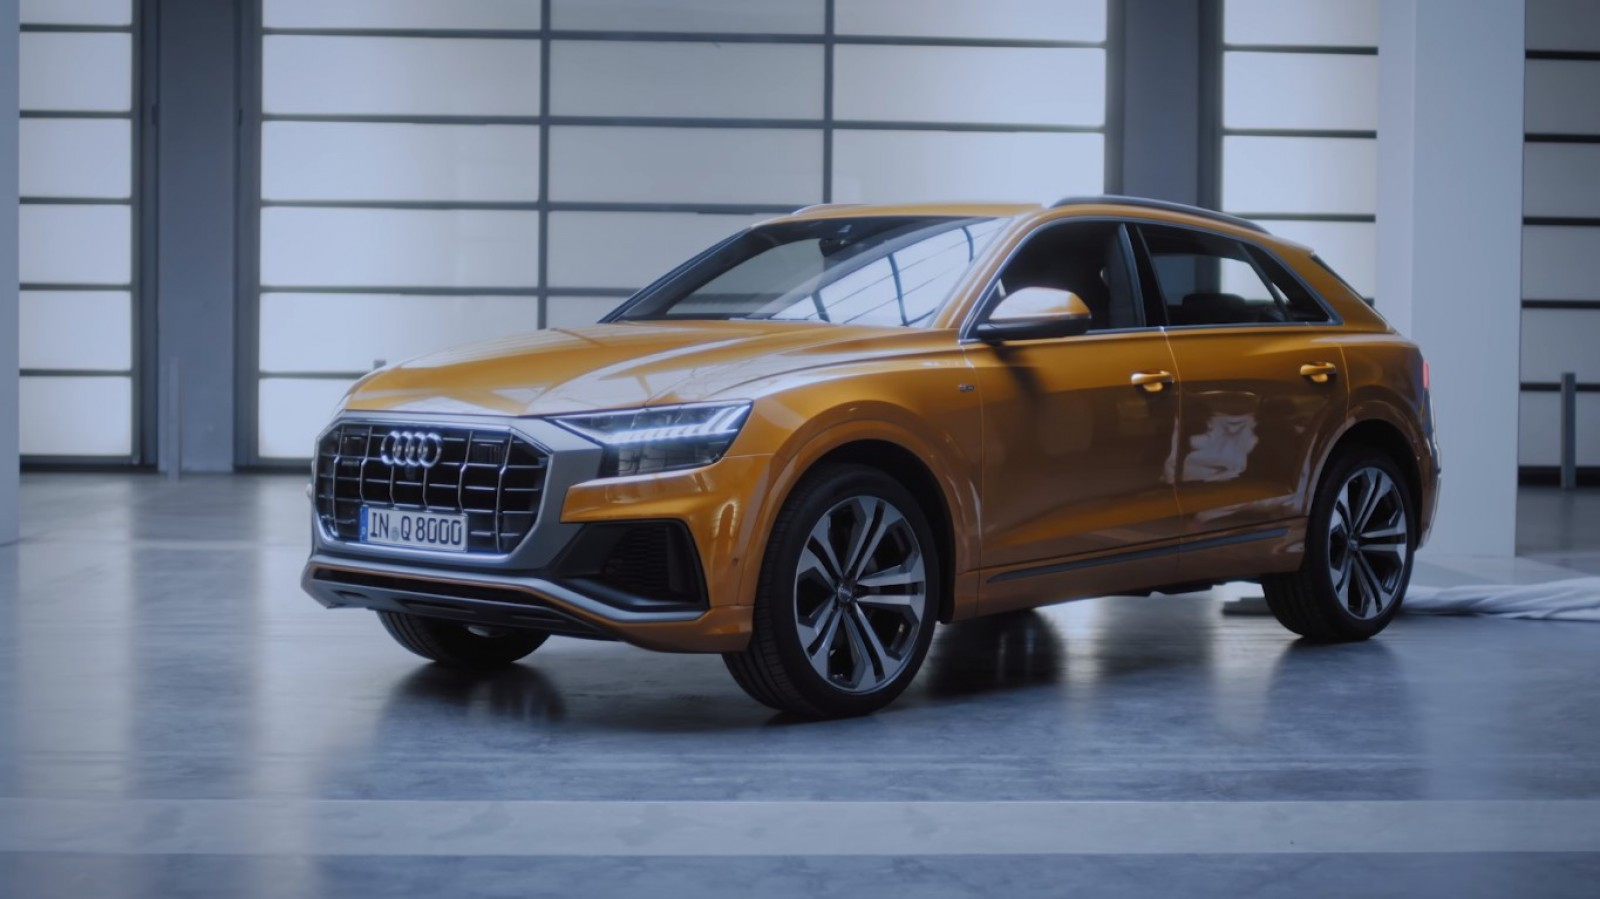 (update/video) Noul Audi Q8 a fost prezentat. Cum s-a încheiat povestea din mini serialul în care a participat